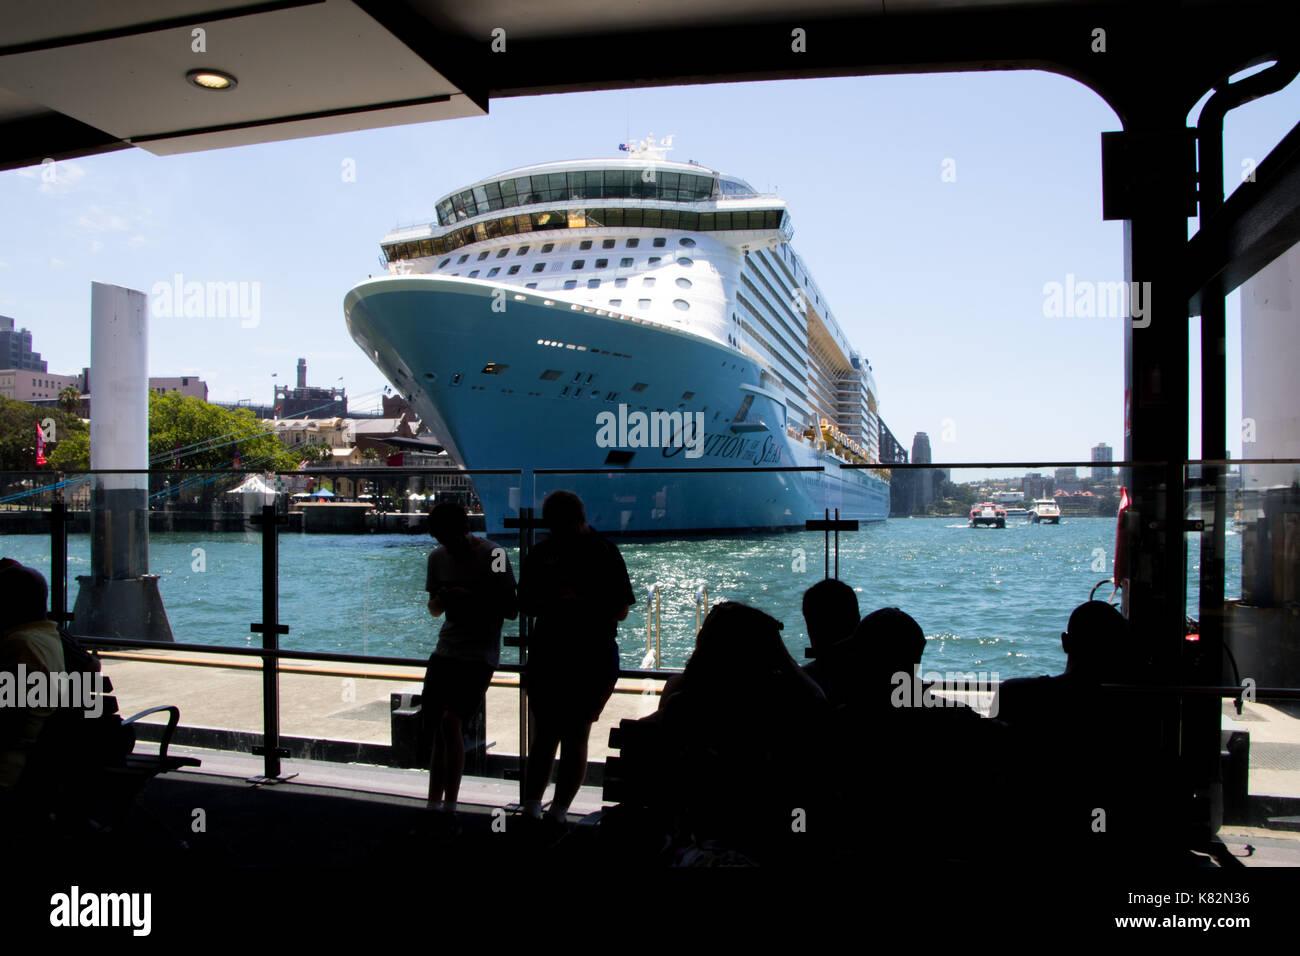 Cruise ship at the Overseas Passenger Terminal at Circular Quay, Sydney - Stock Image